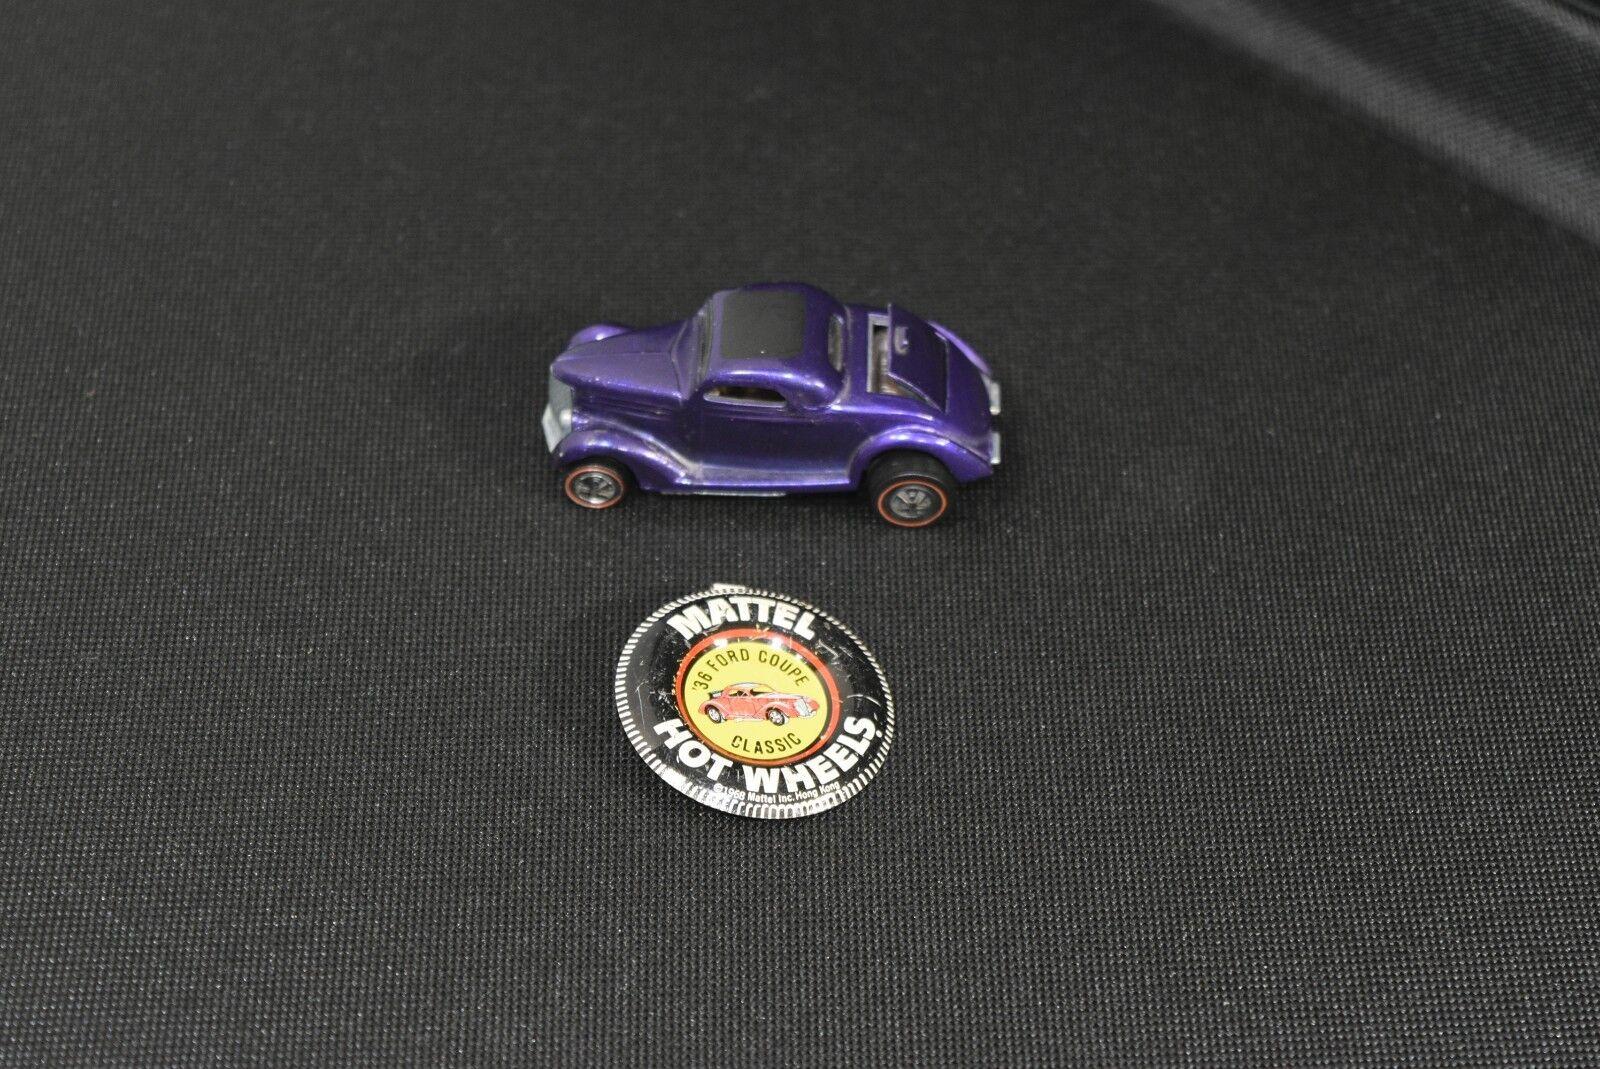 Original 1968 Hot Wheels Redline Classic '36 Ford Coupe in Purple + Button